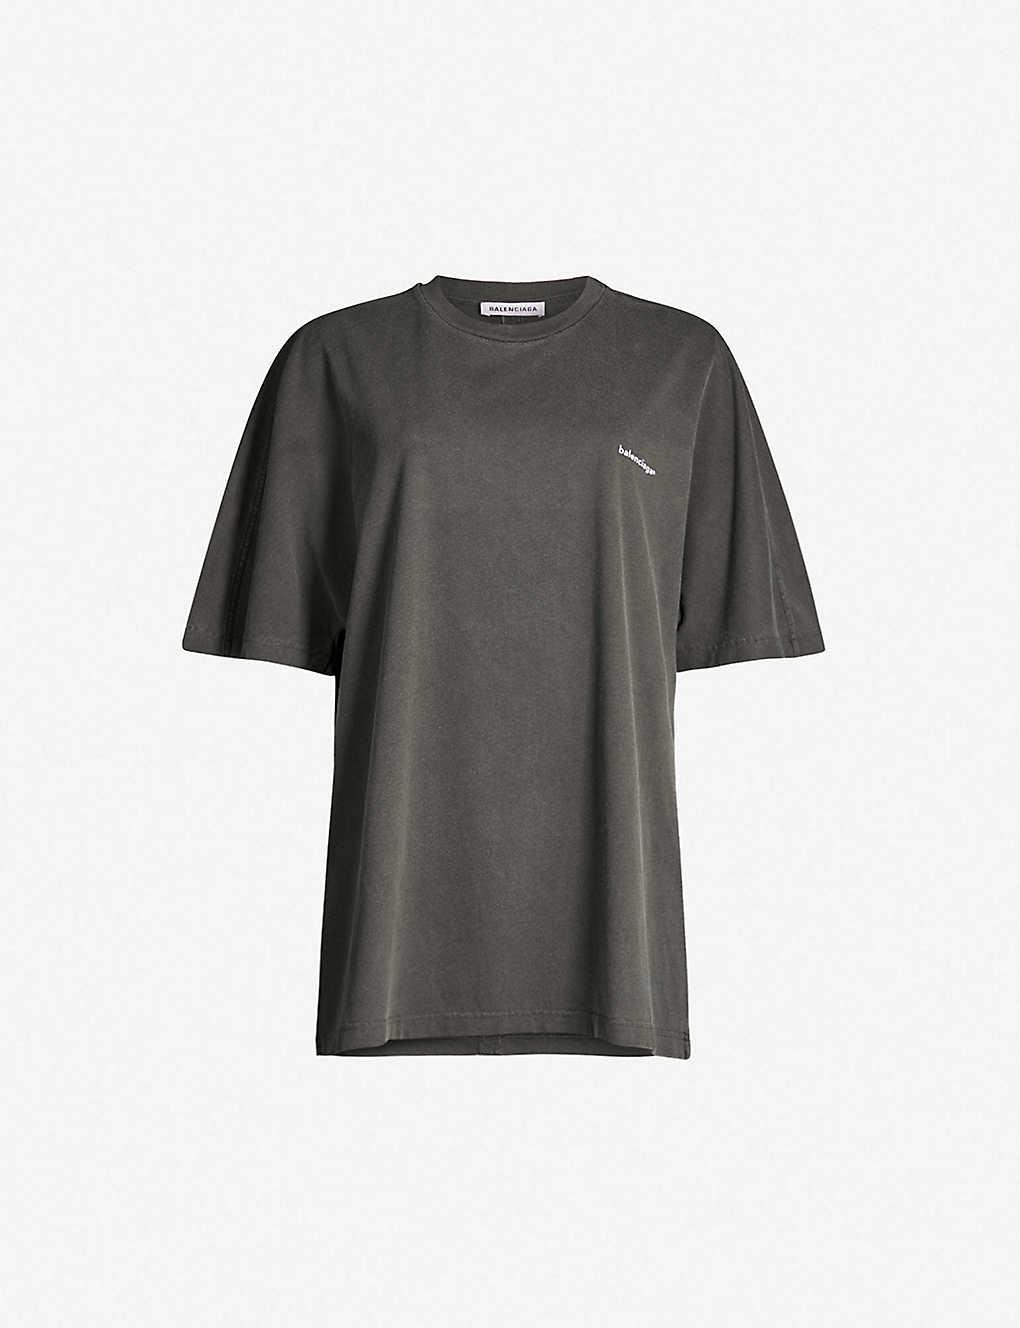 Balenciaga Shirts Oversized cotton-jersey T-shirt